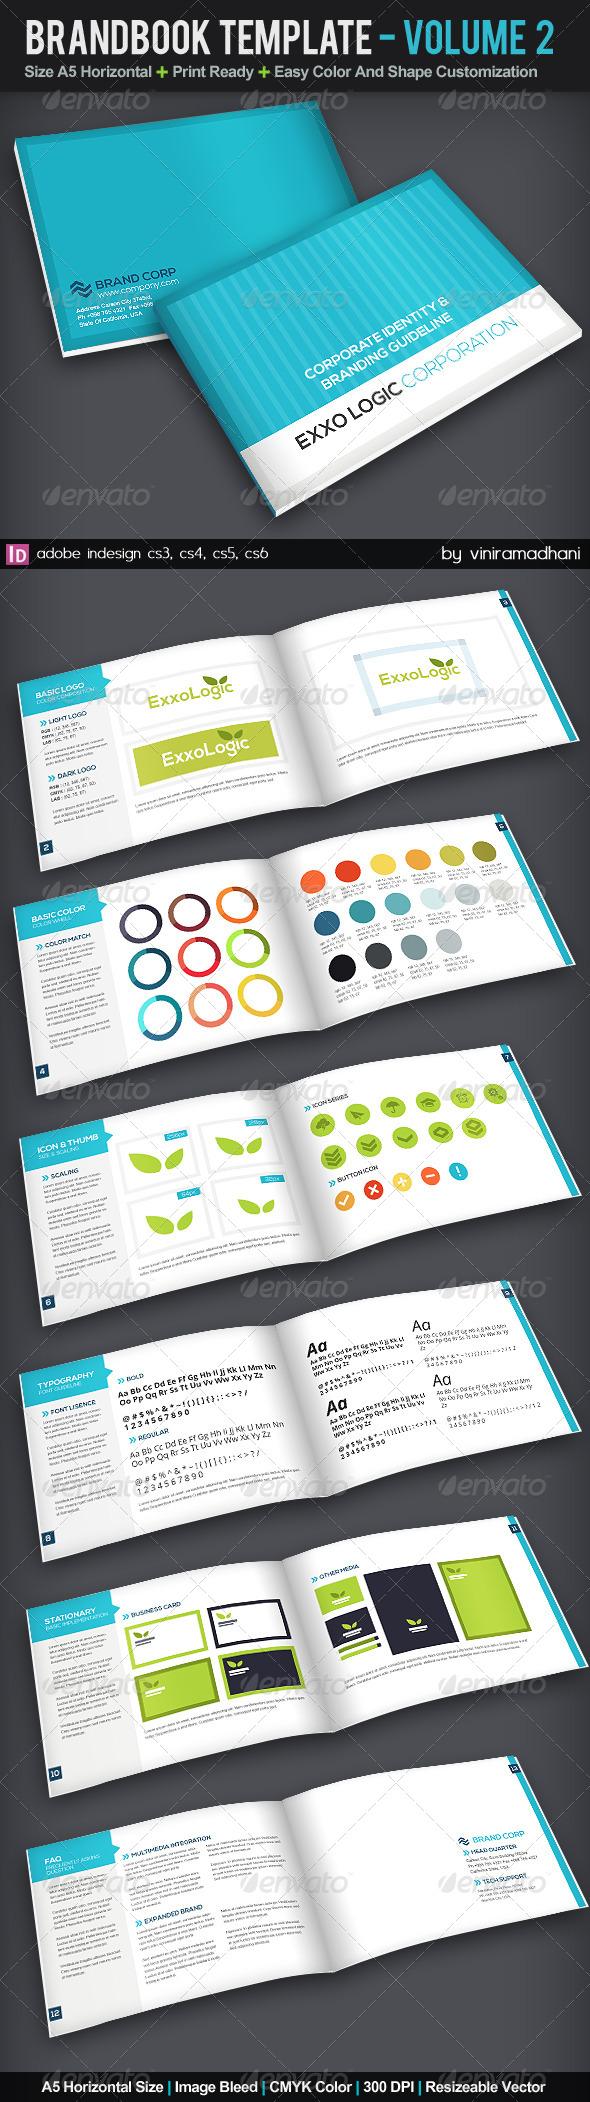 GraphicRiver BrandBook Template Volume 2 5723482